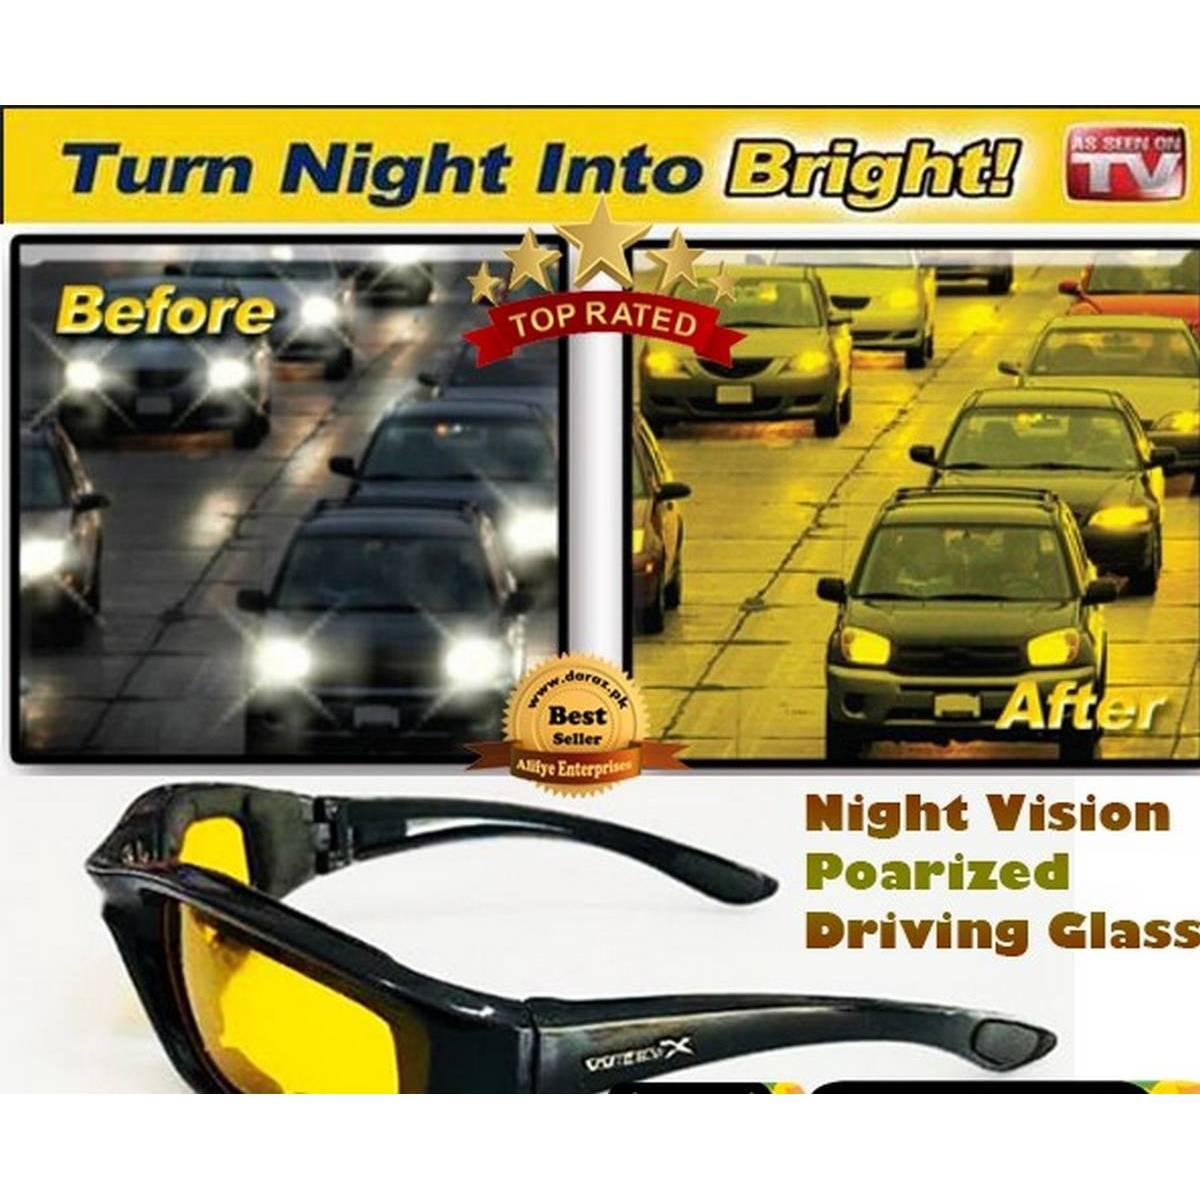 Day and Night Vision Glasses For Men Bike, Car Drivers Anti Glare Polarized Night Driving Unisex Sunglasses Goggles Auto Accessories